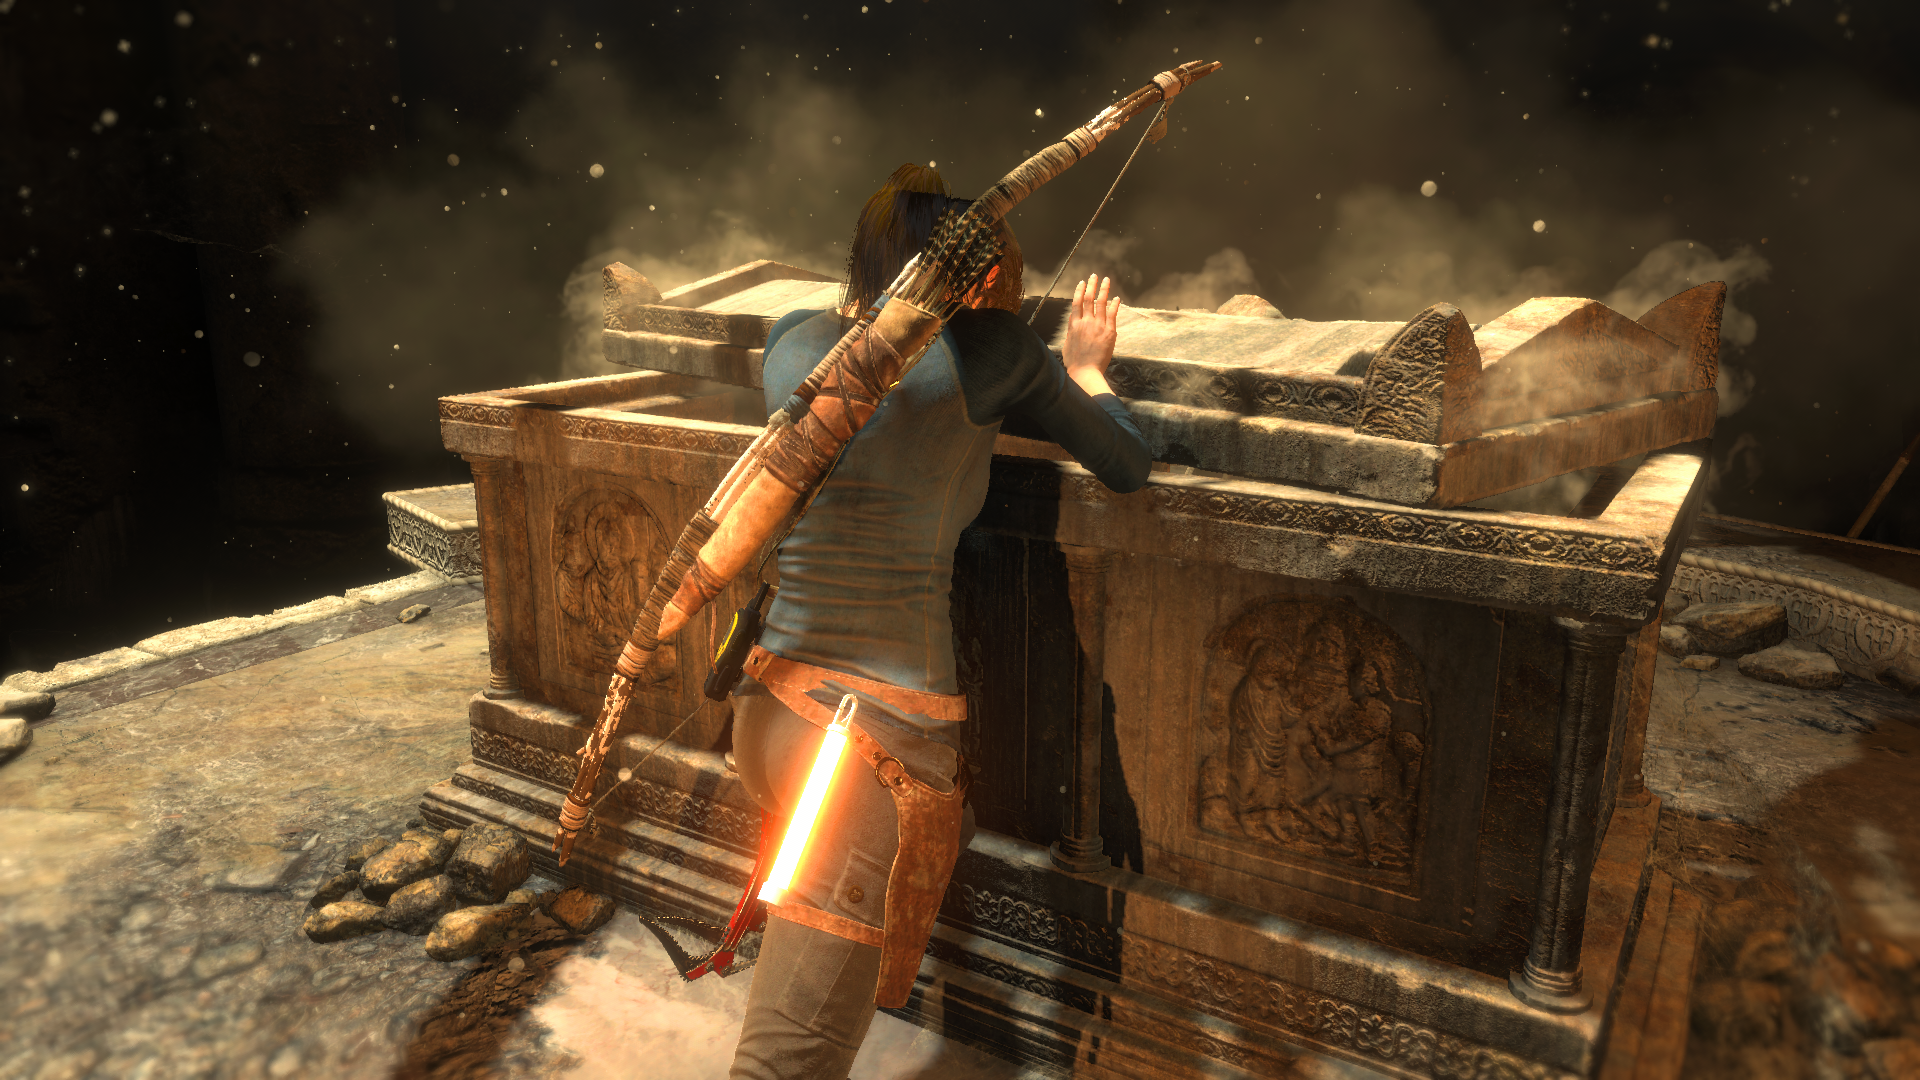 General 1920x1080 Rise of the Tomb Raider Tomb Raider screen shot Lara Croft video games